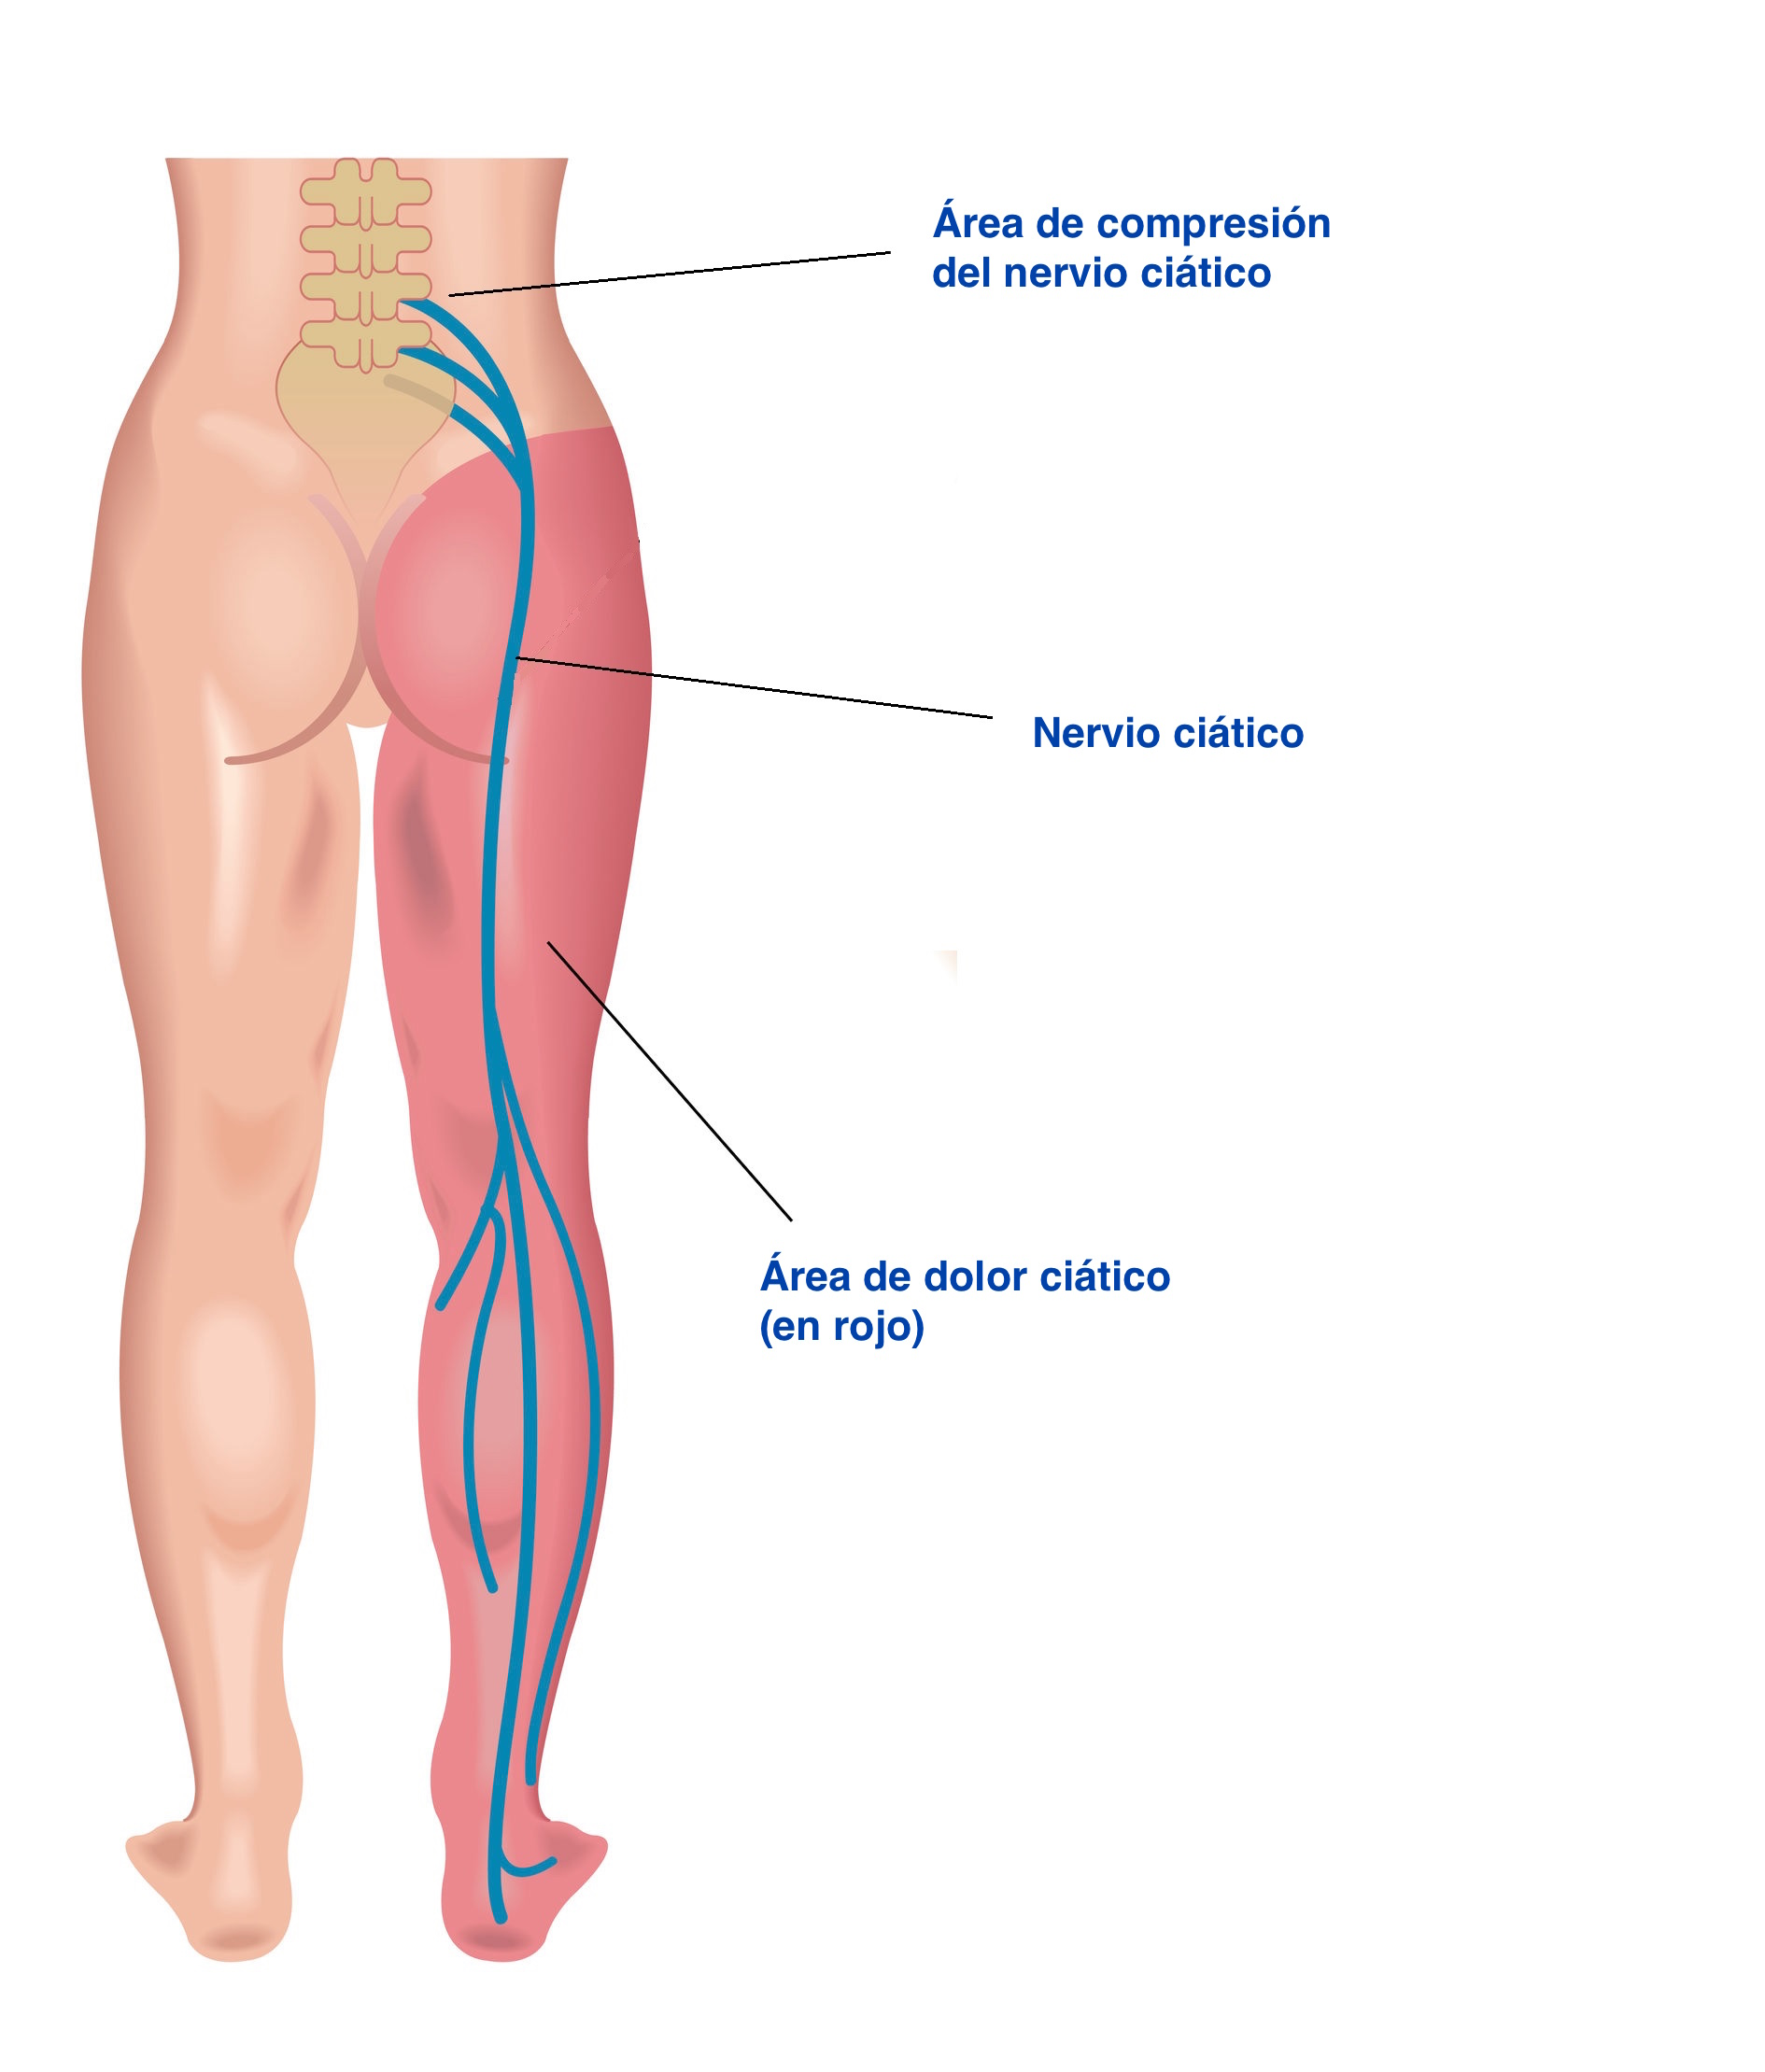 qué causa tu nervio ciático